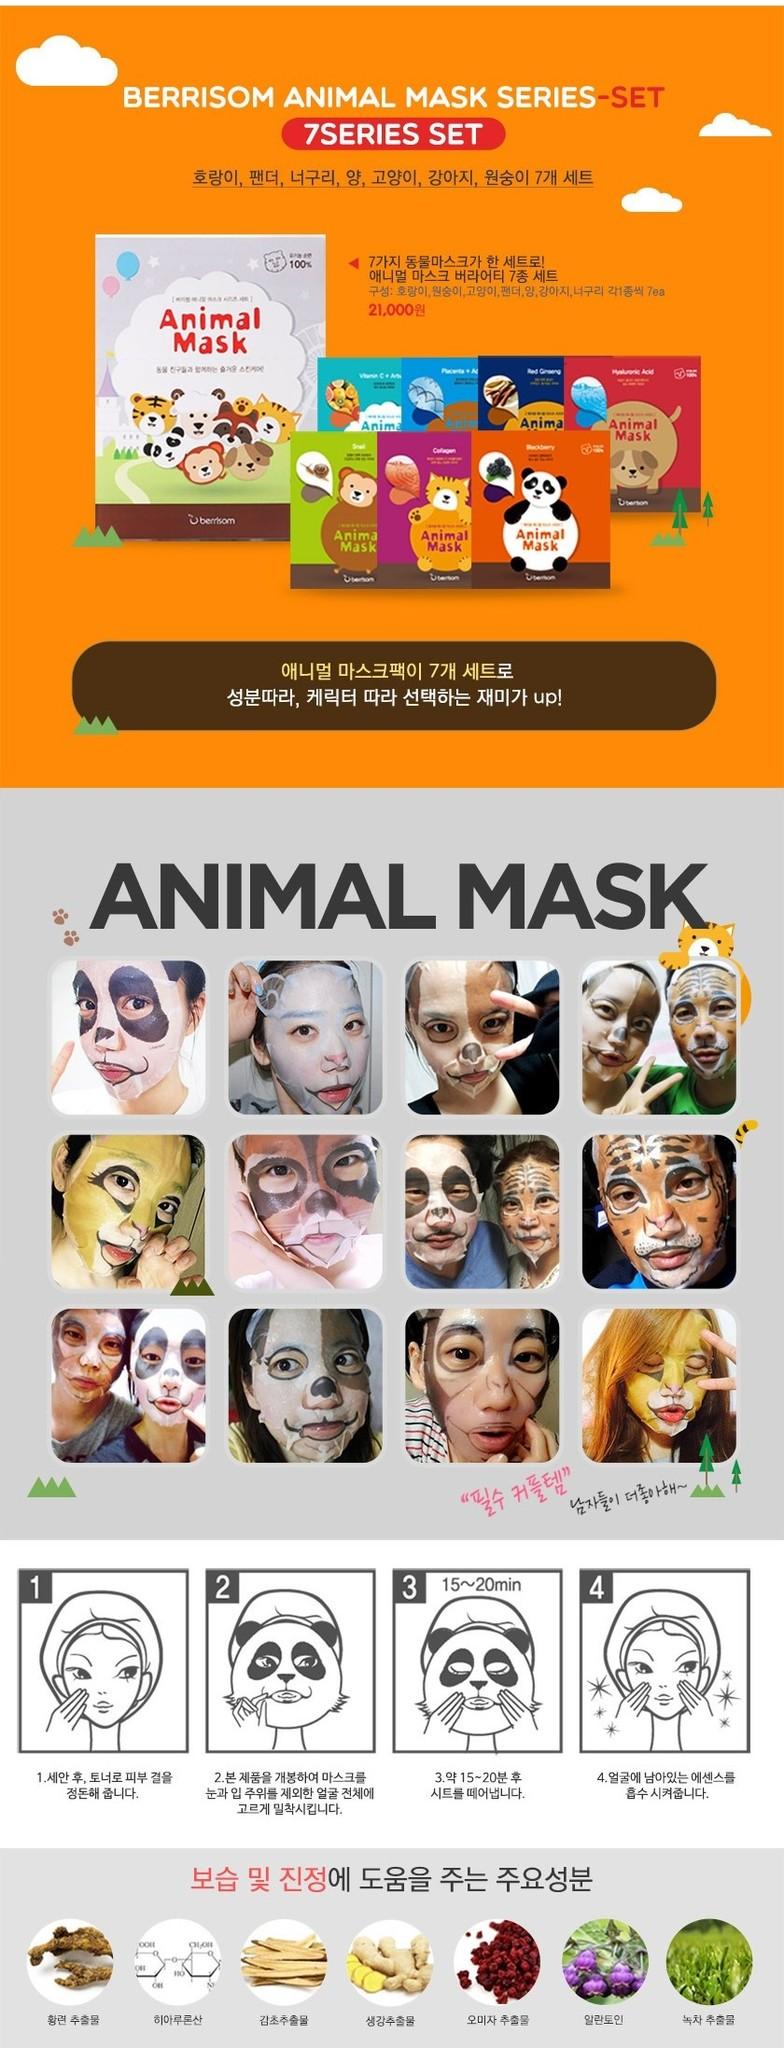 Animal Mask Series - Racoon-6